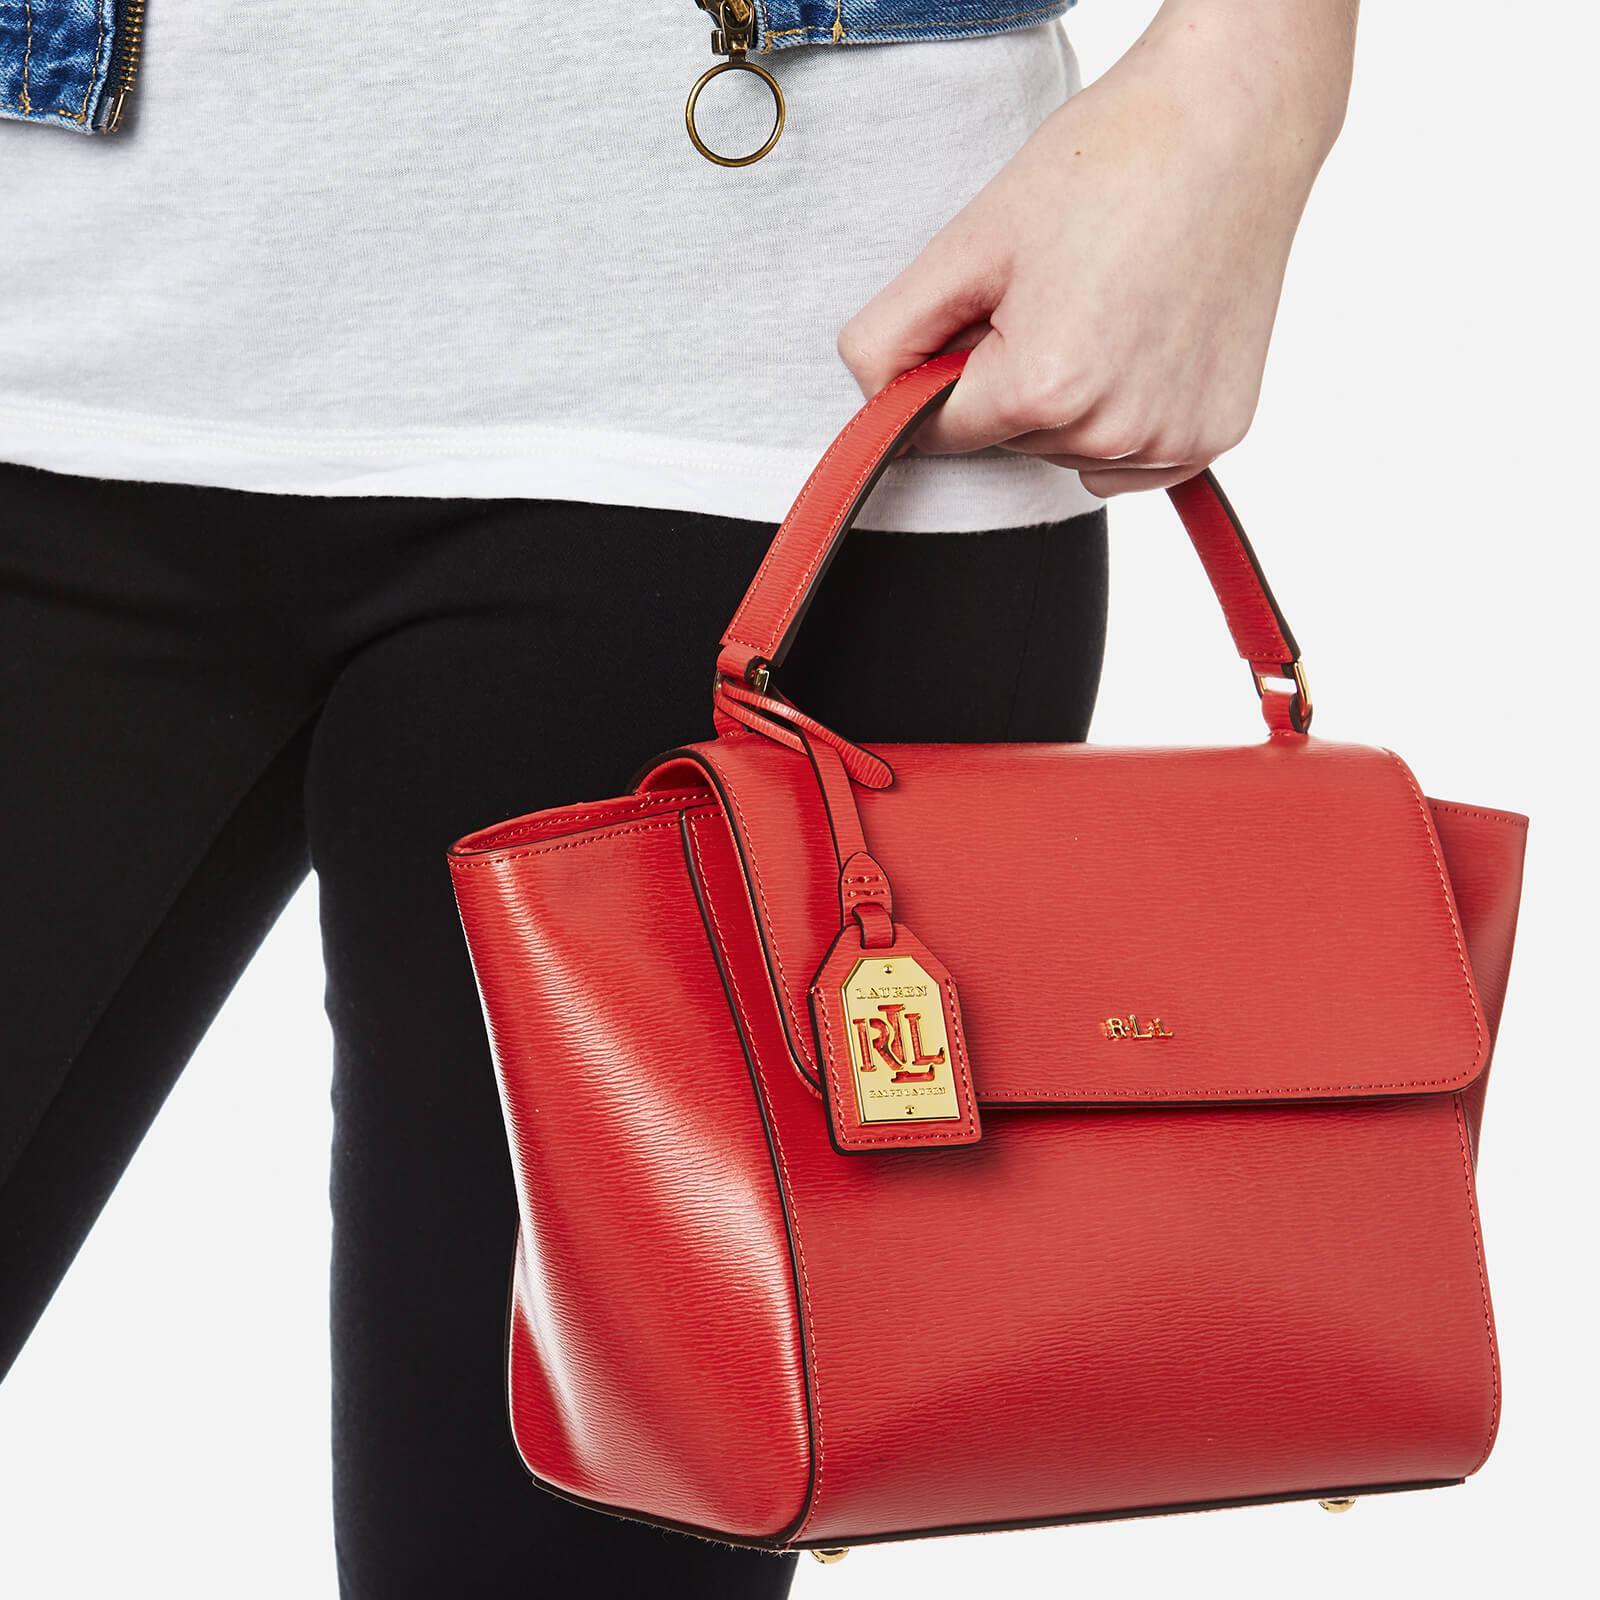 Lyst - Ralph Lauren Barclay Cross Body Bag in Red 634daa012f